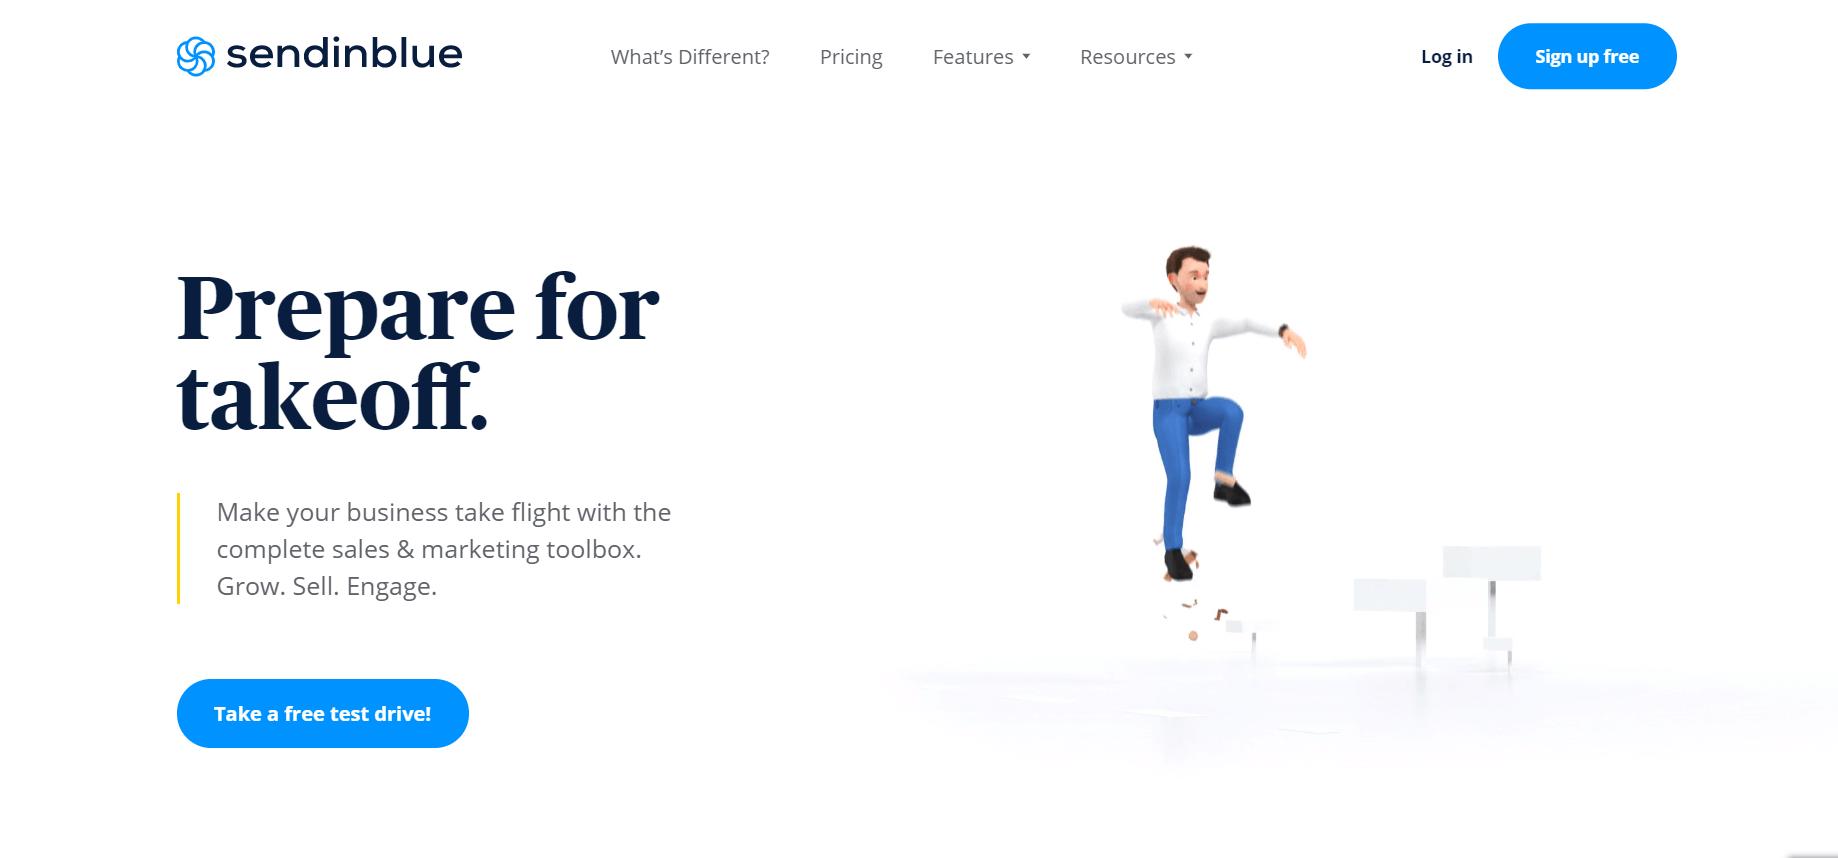 SendinBlue email marketing platform